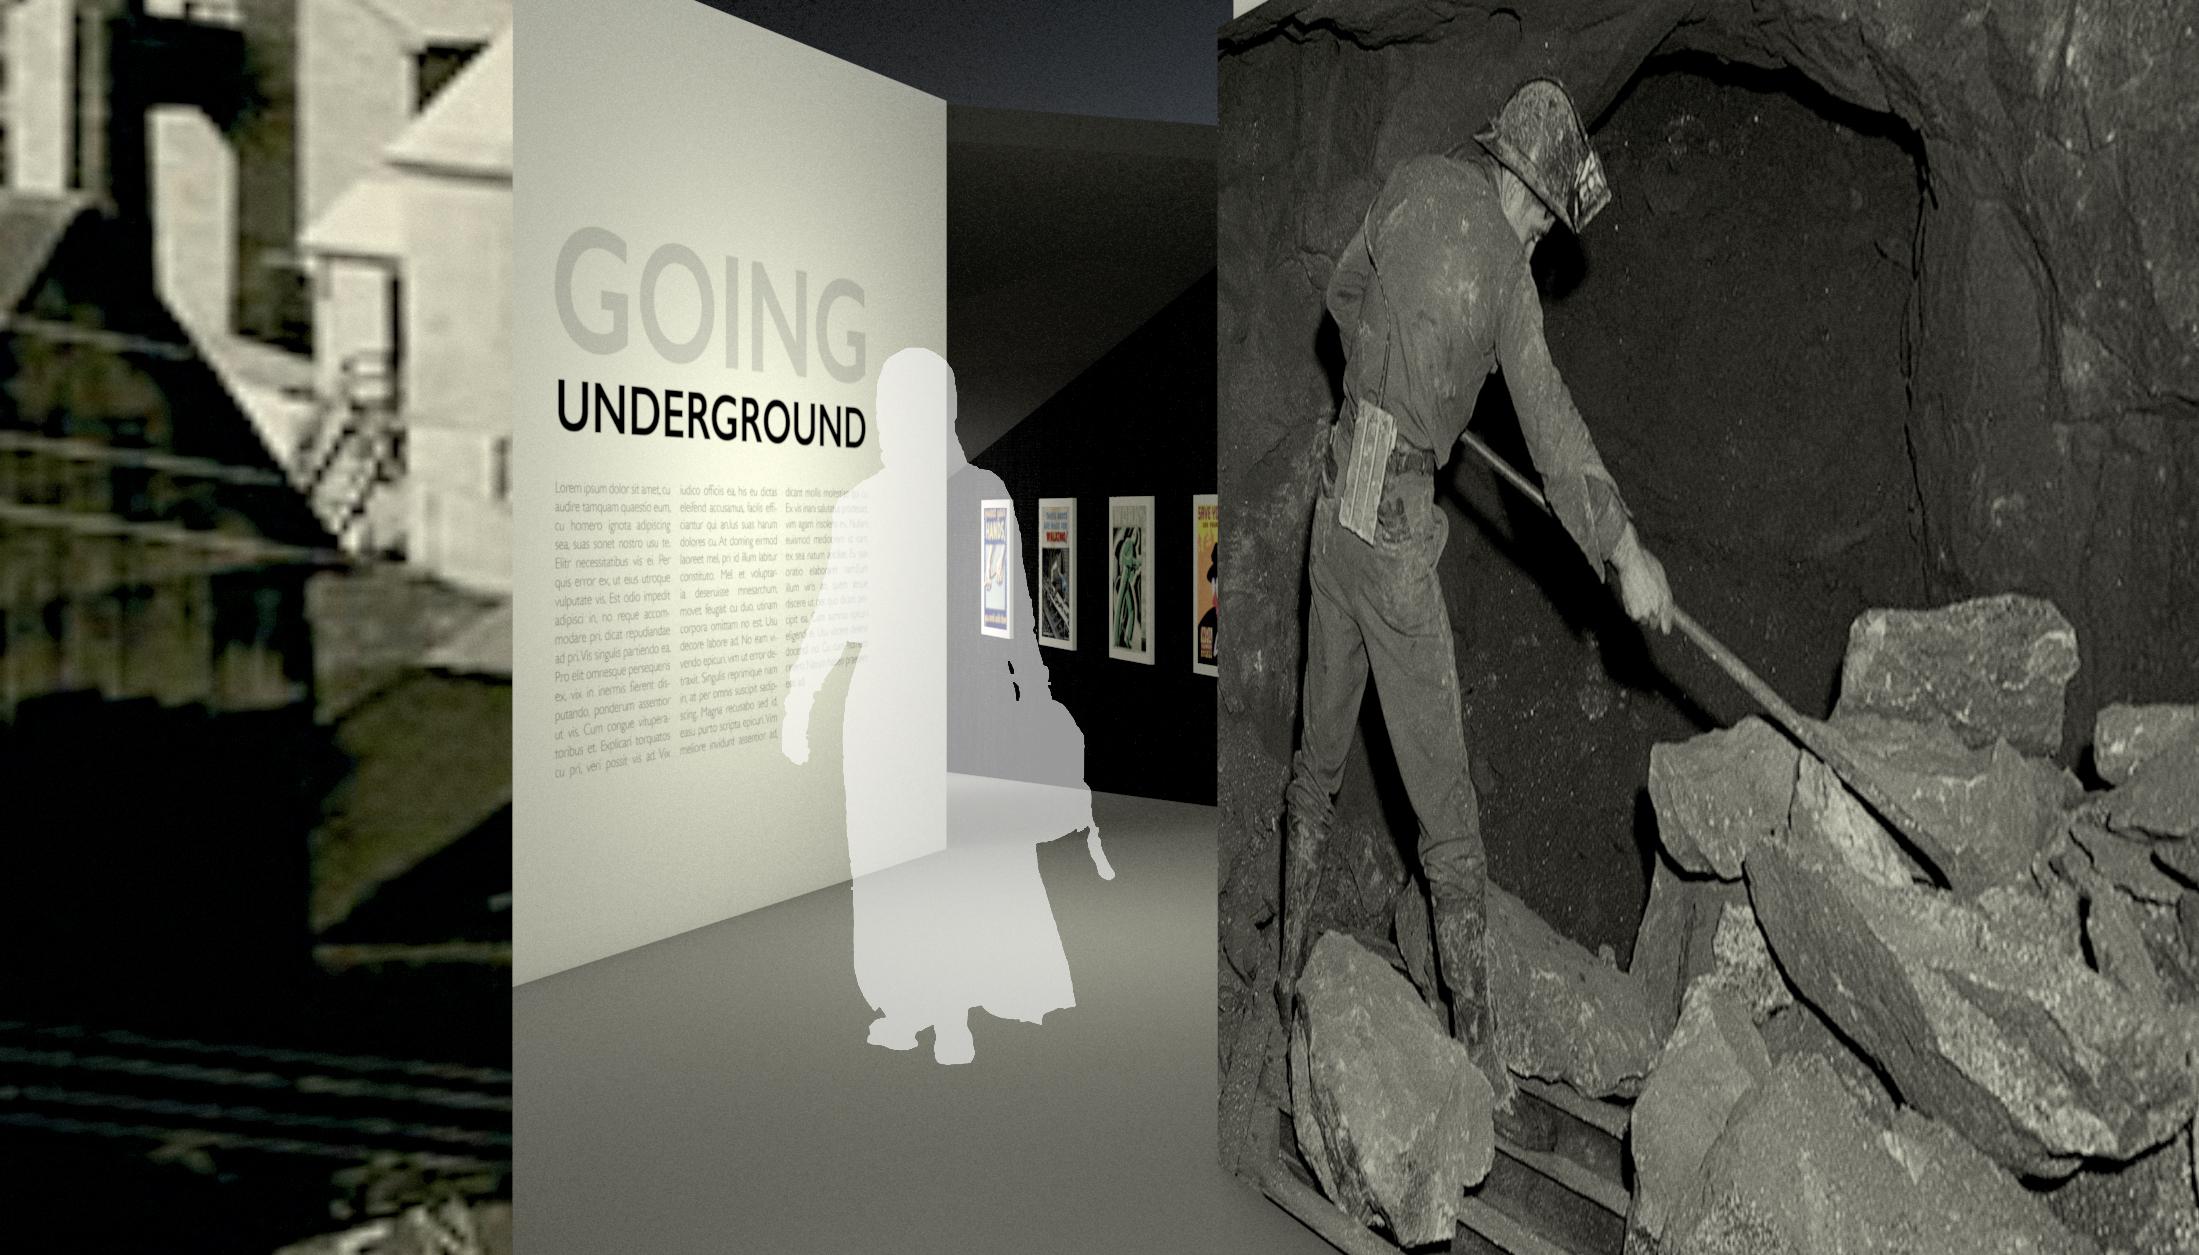 cole_miners_going_underground.jpg